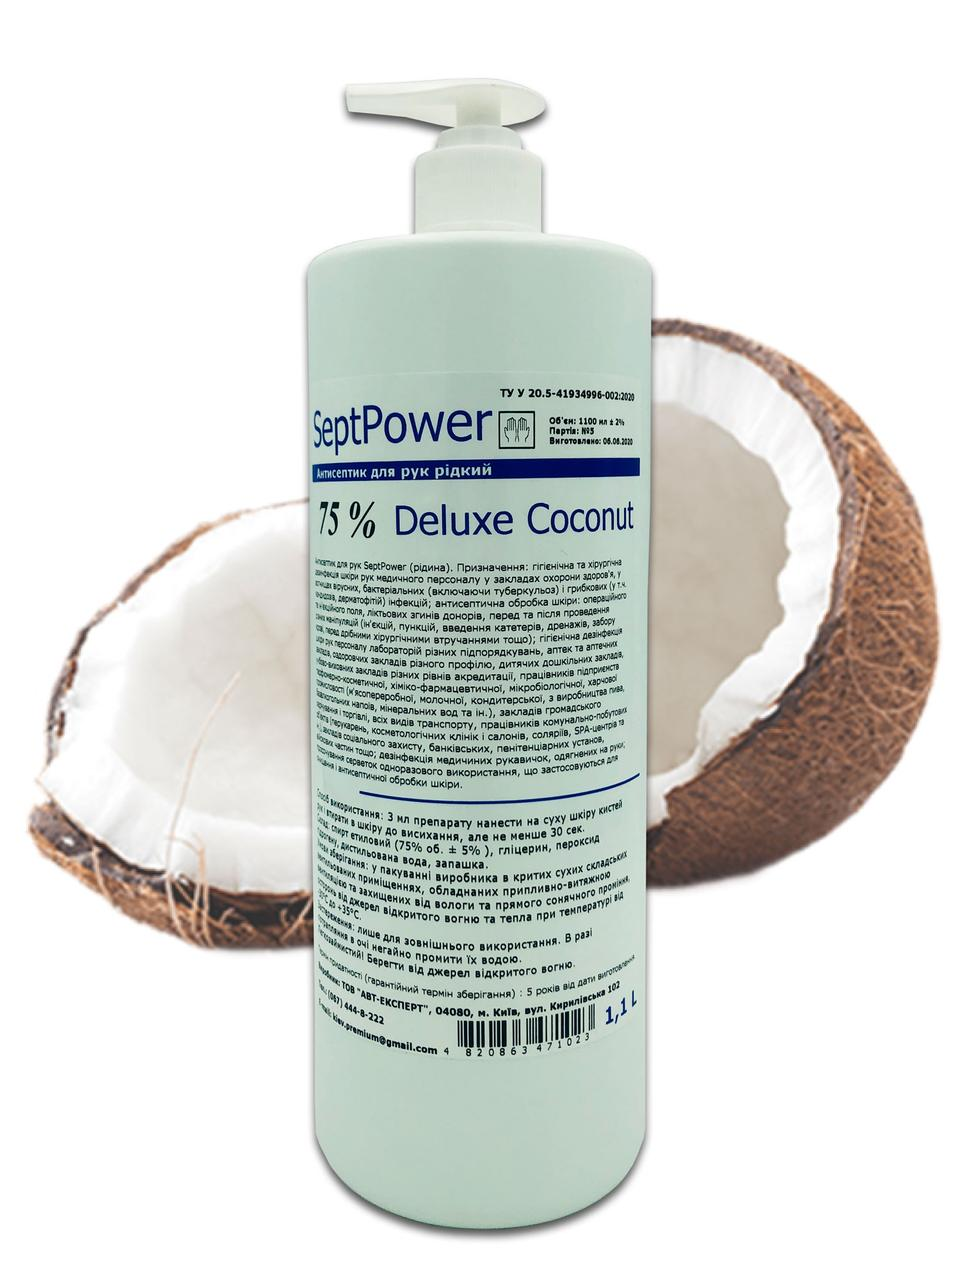 Антисептик спиртовой для рук 75% спирта SeptPower Deluxe Coconut 1.1 l